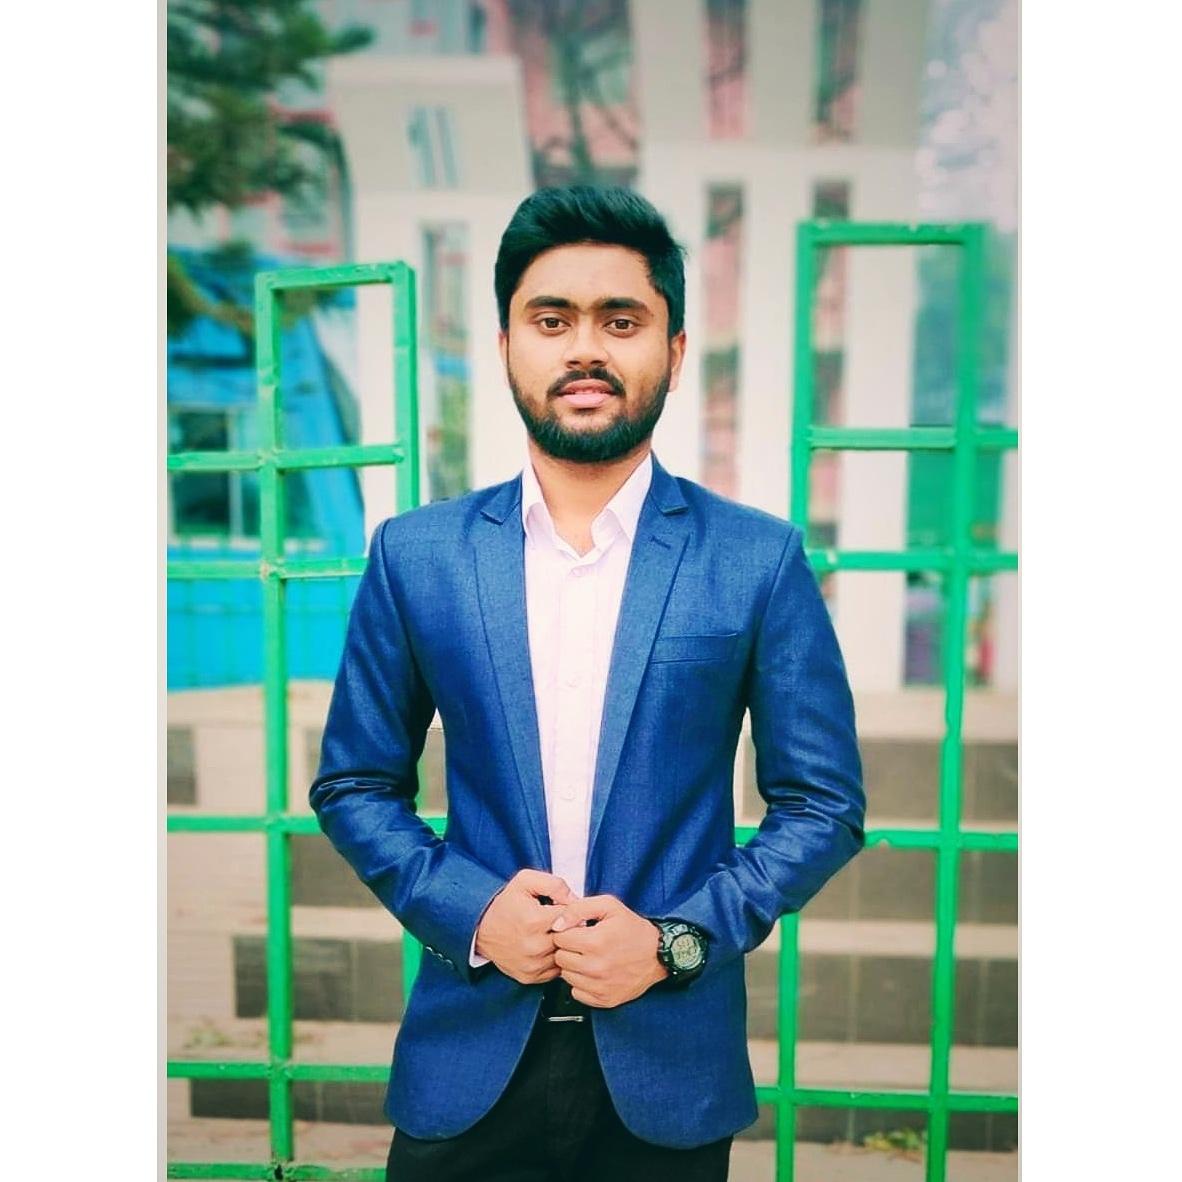 Tracing The Success Of Youngest Musical Artist & Entrepreneur, Mahfujur Rahman